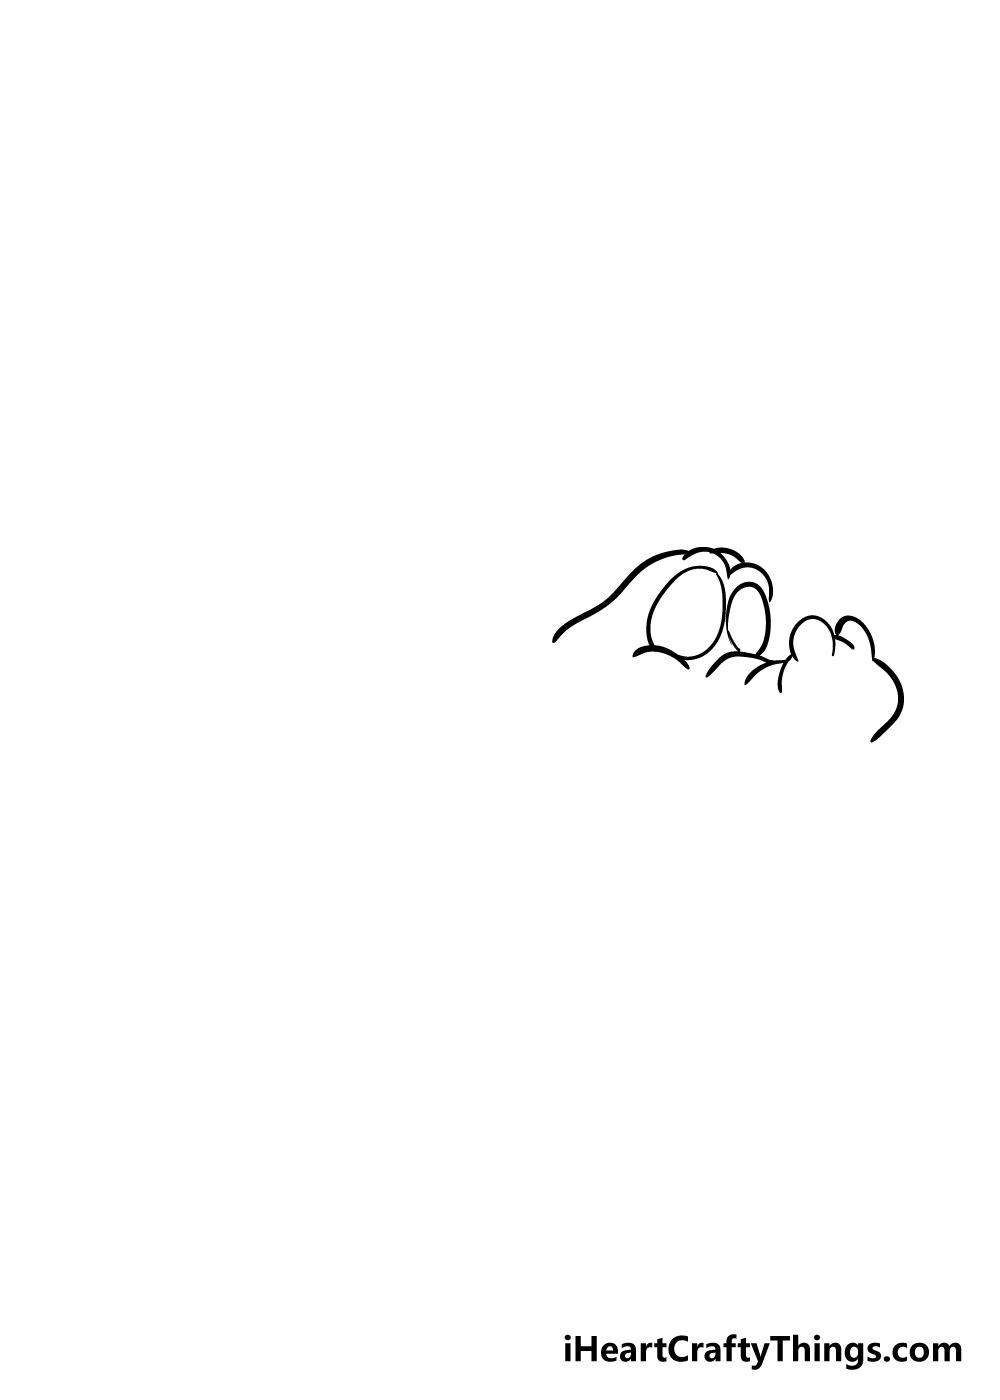 crocodile drawing step 2